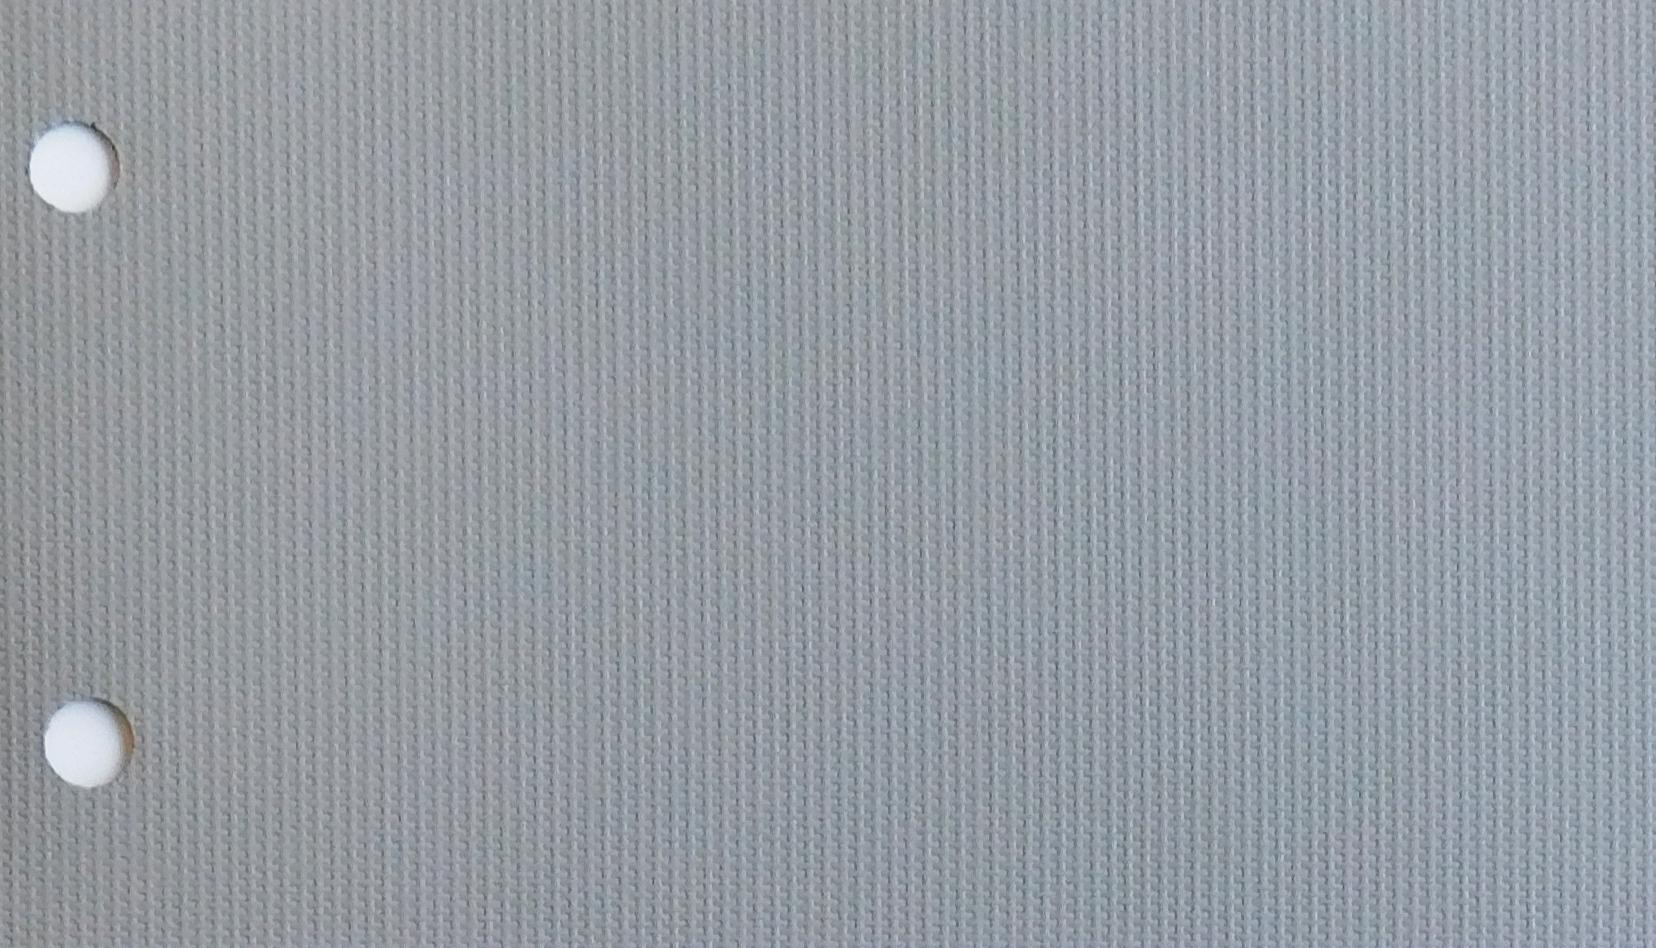 Unliux Granite Vertical blind fabric